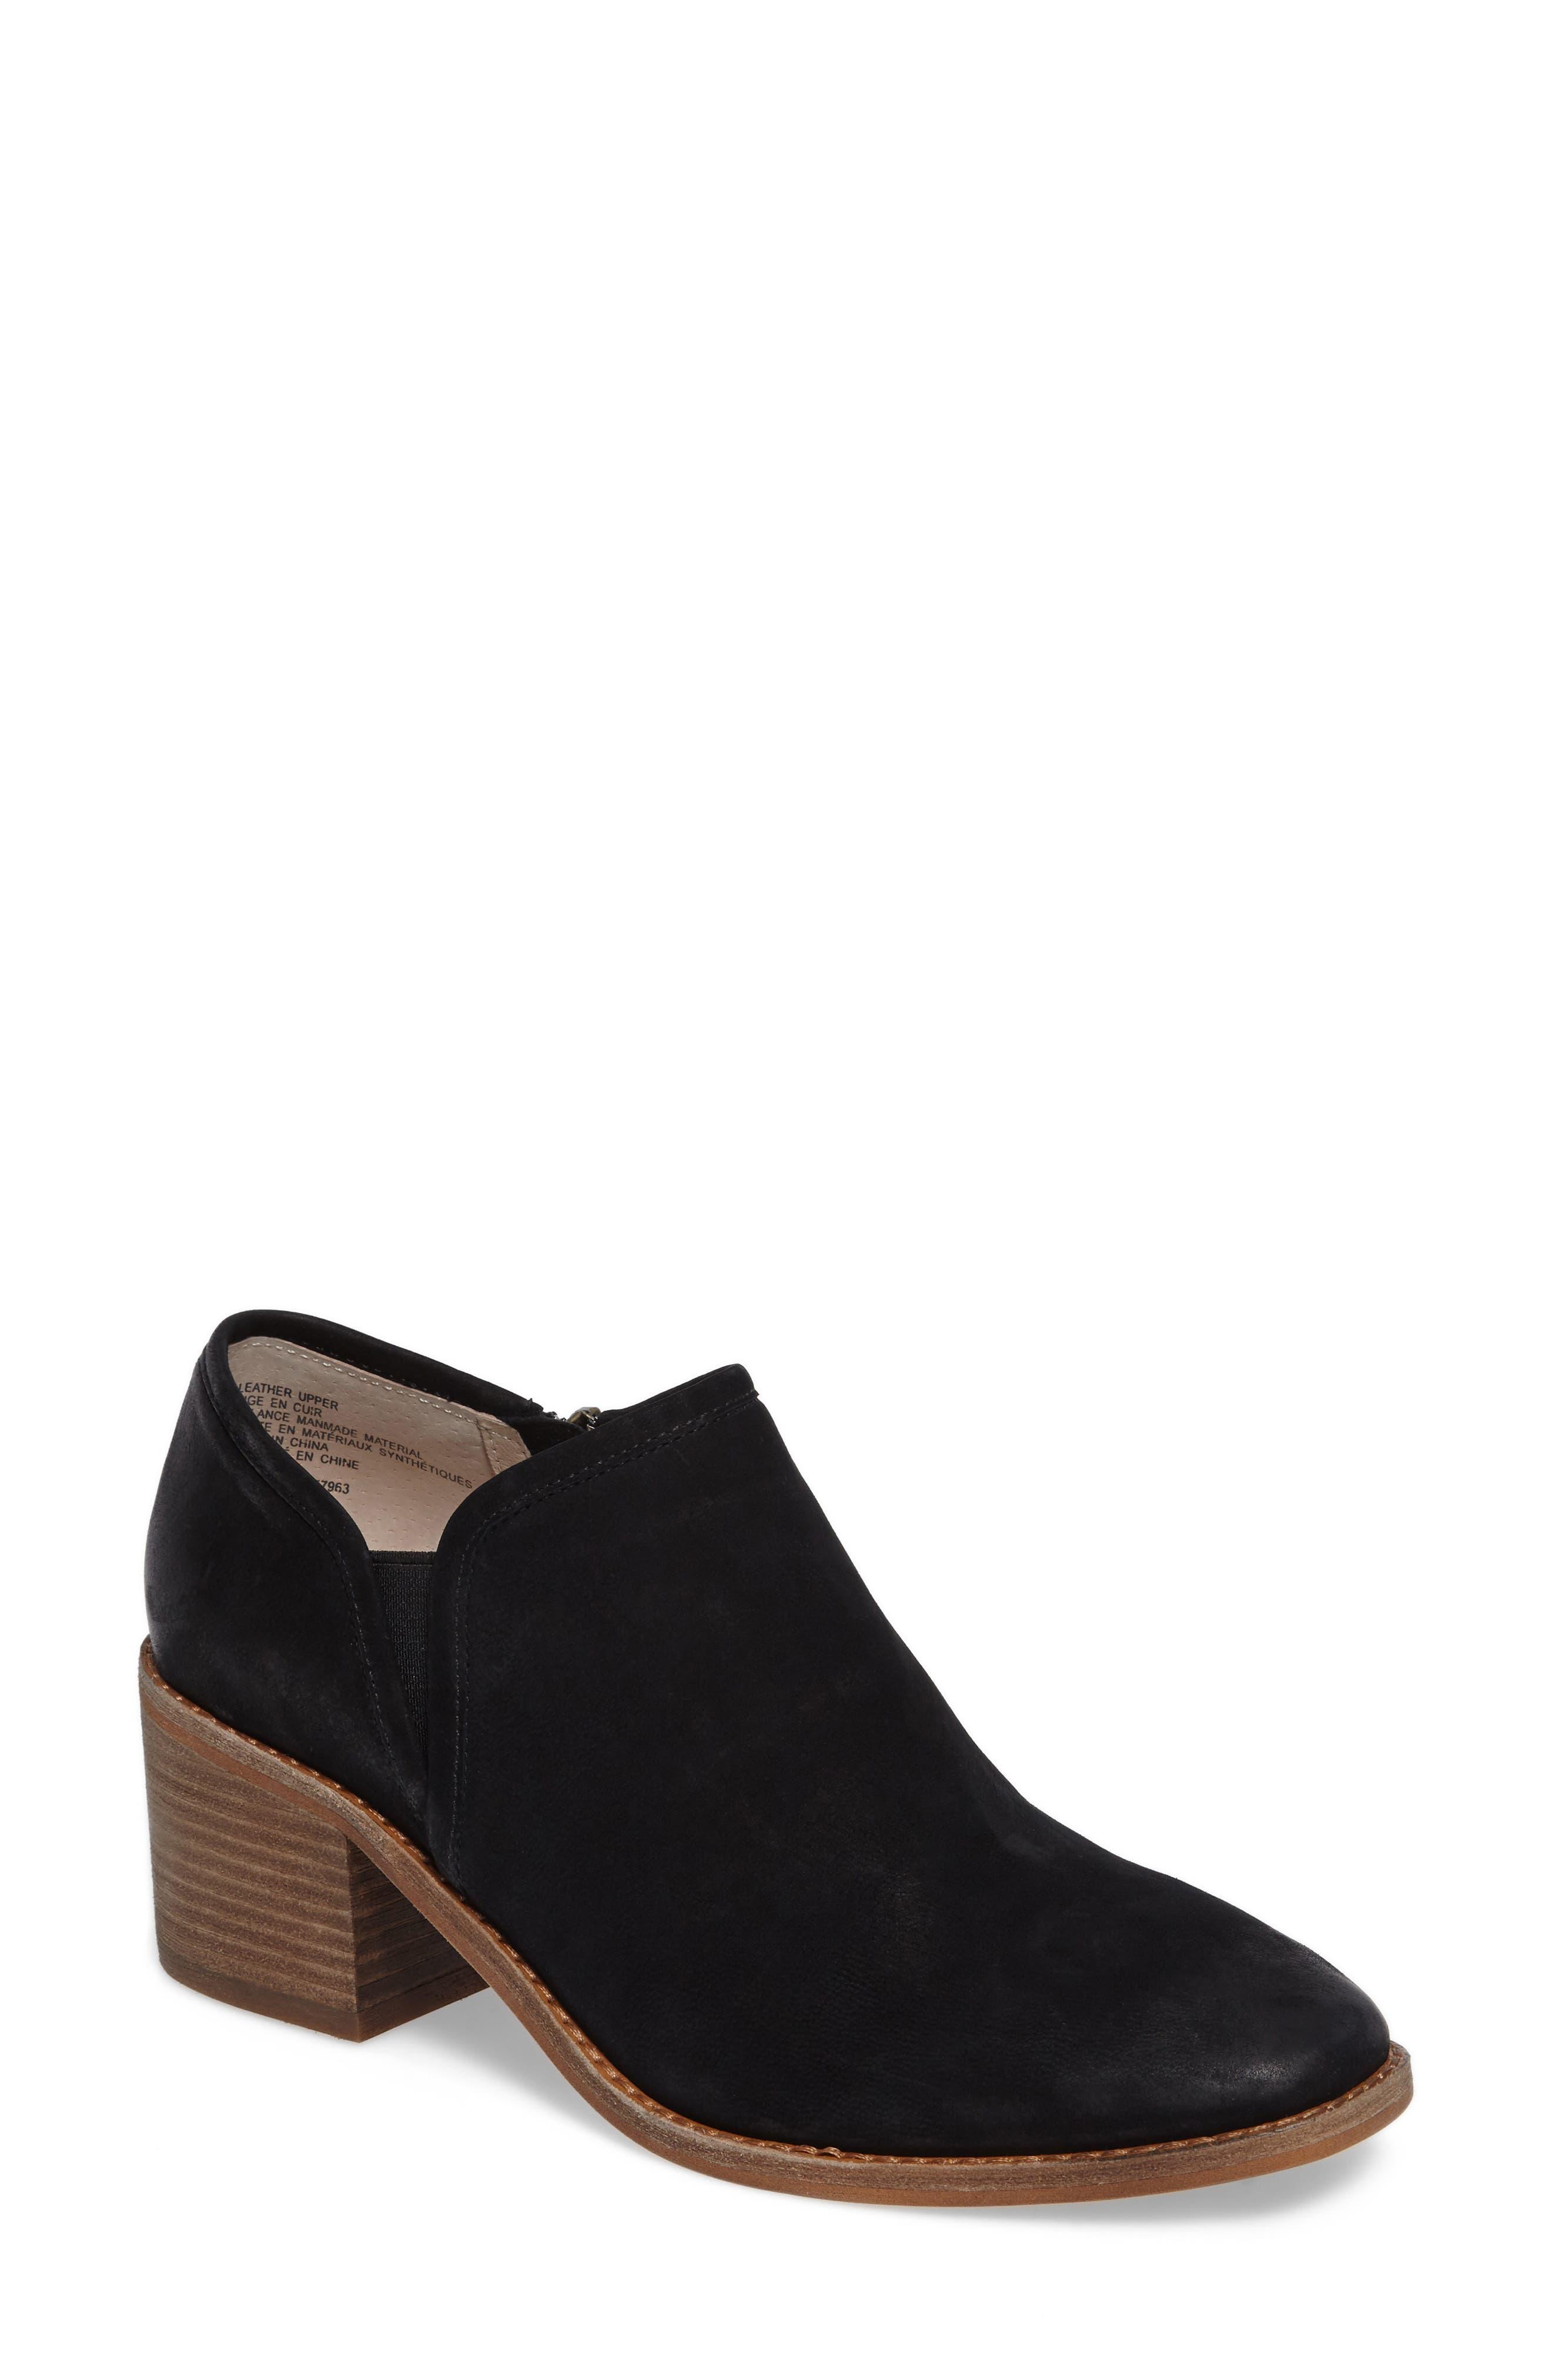 CASLON<SUP>®</SUP> Faye Block Heel Bootie, Main, color, 001